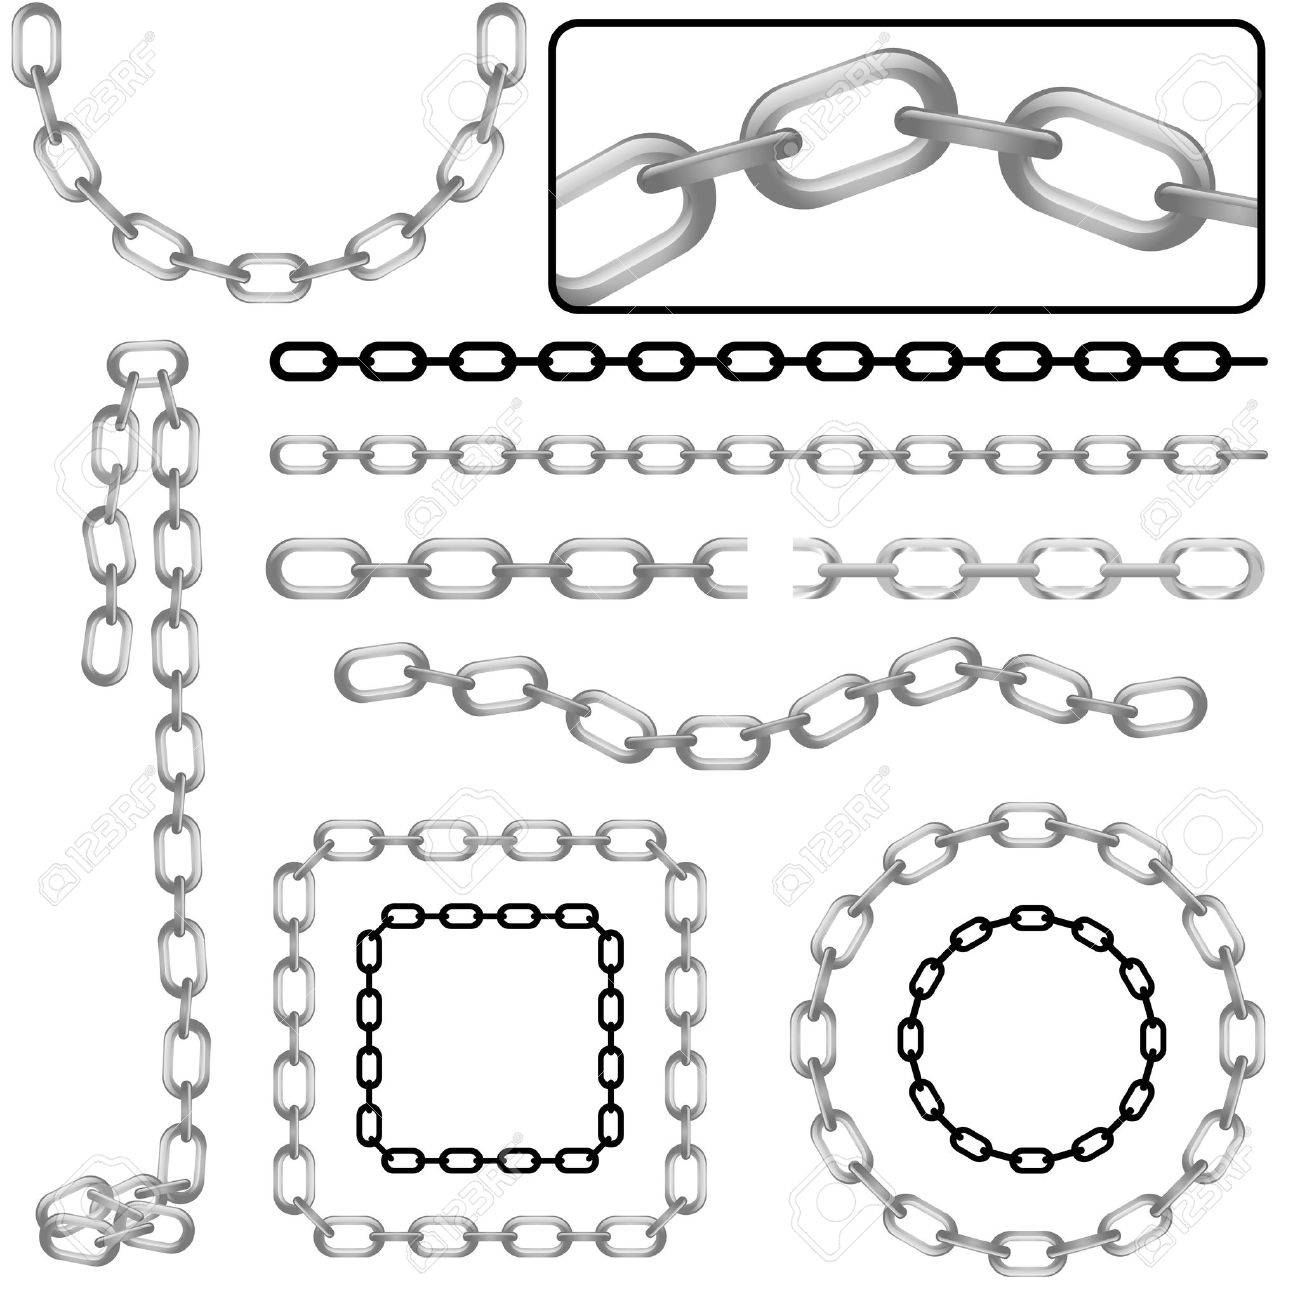 set of chain Stock Vector - 8198156